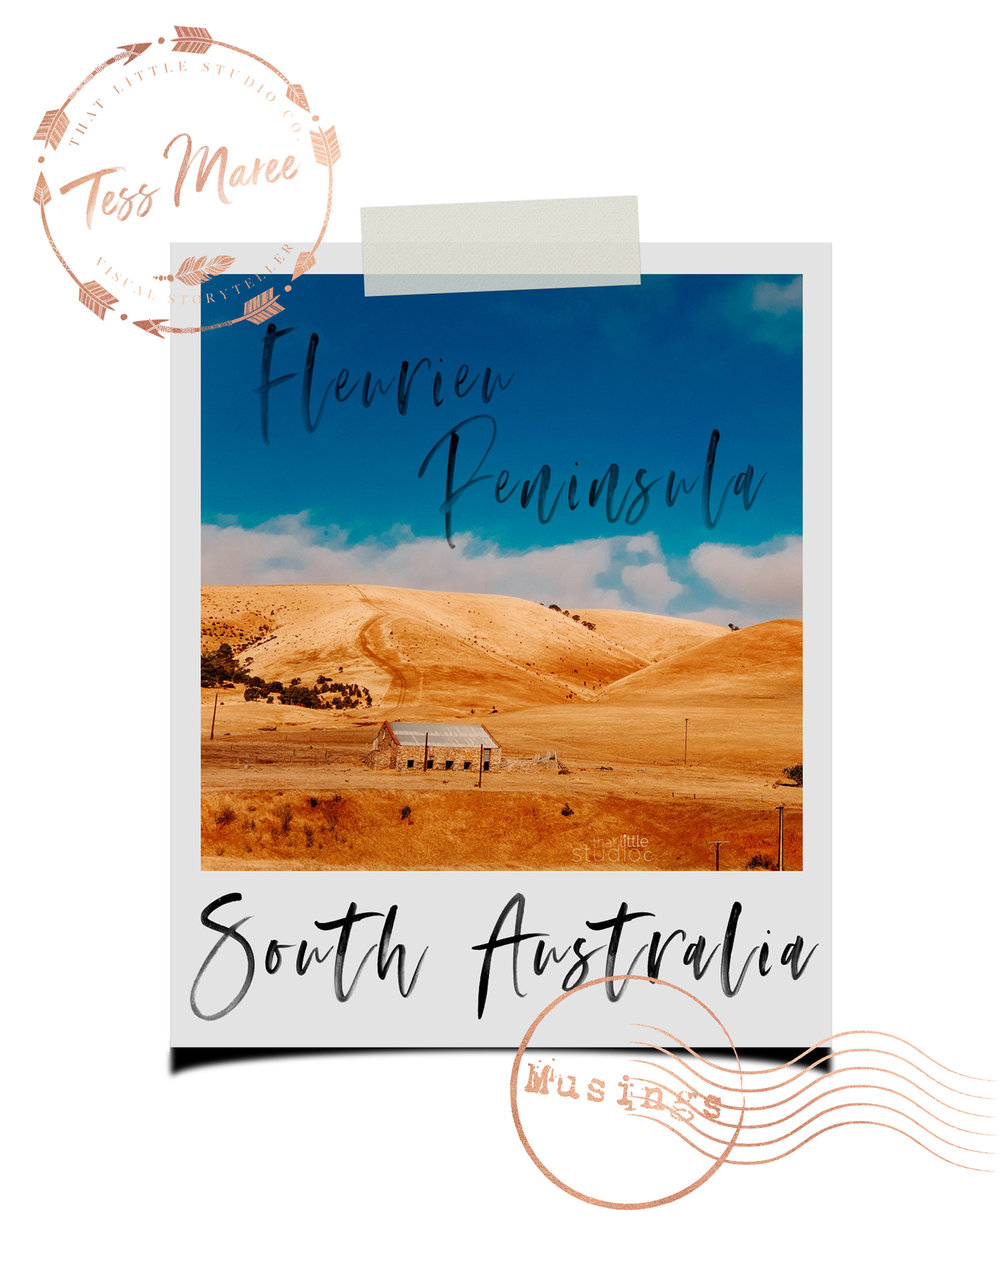 Tess-Maree-Musing-Flerieu-Peninsula-South-Australia-Polaroid